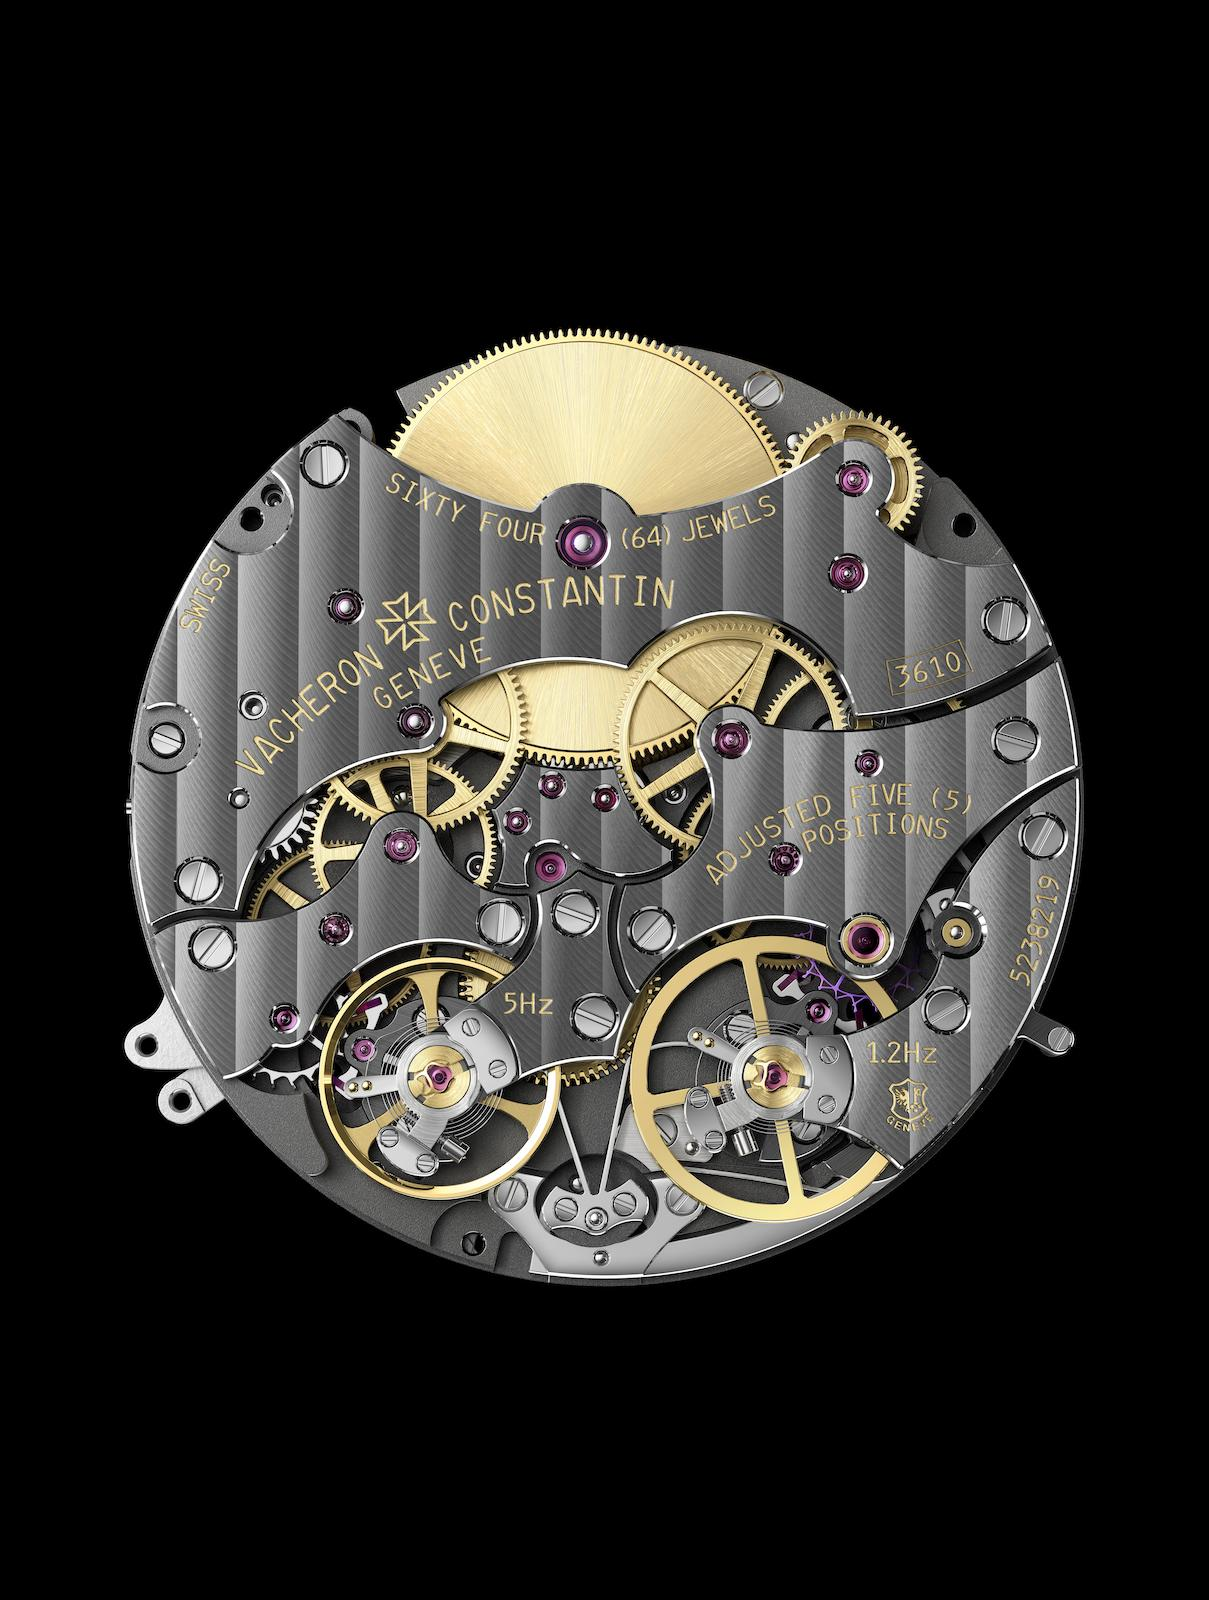 Vacheron Constantin Traditionnelle Twin Beat Perpetual Calendar - calibre 3610 reverso